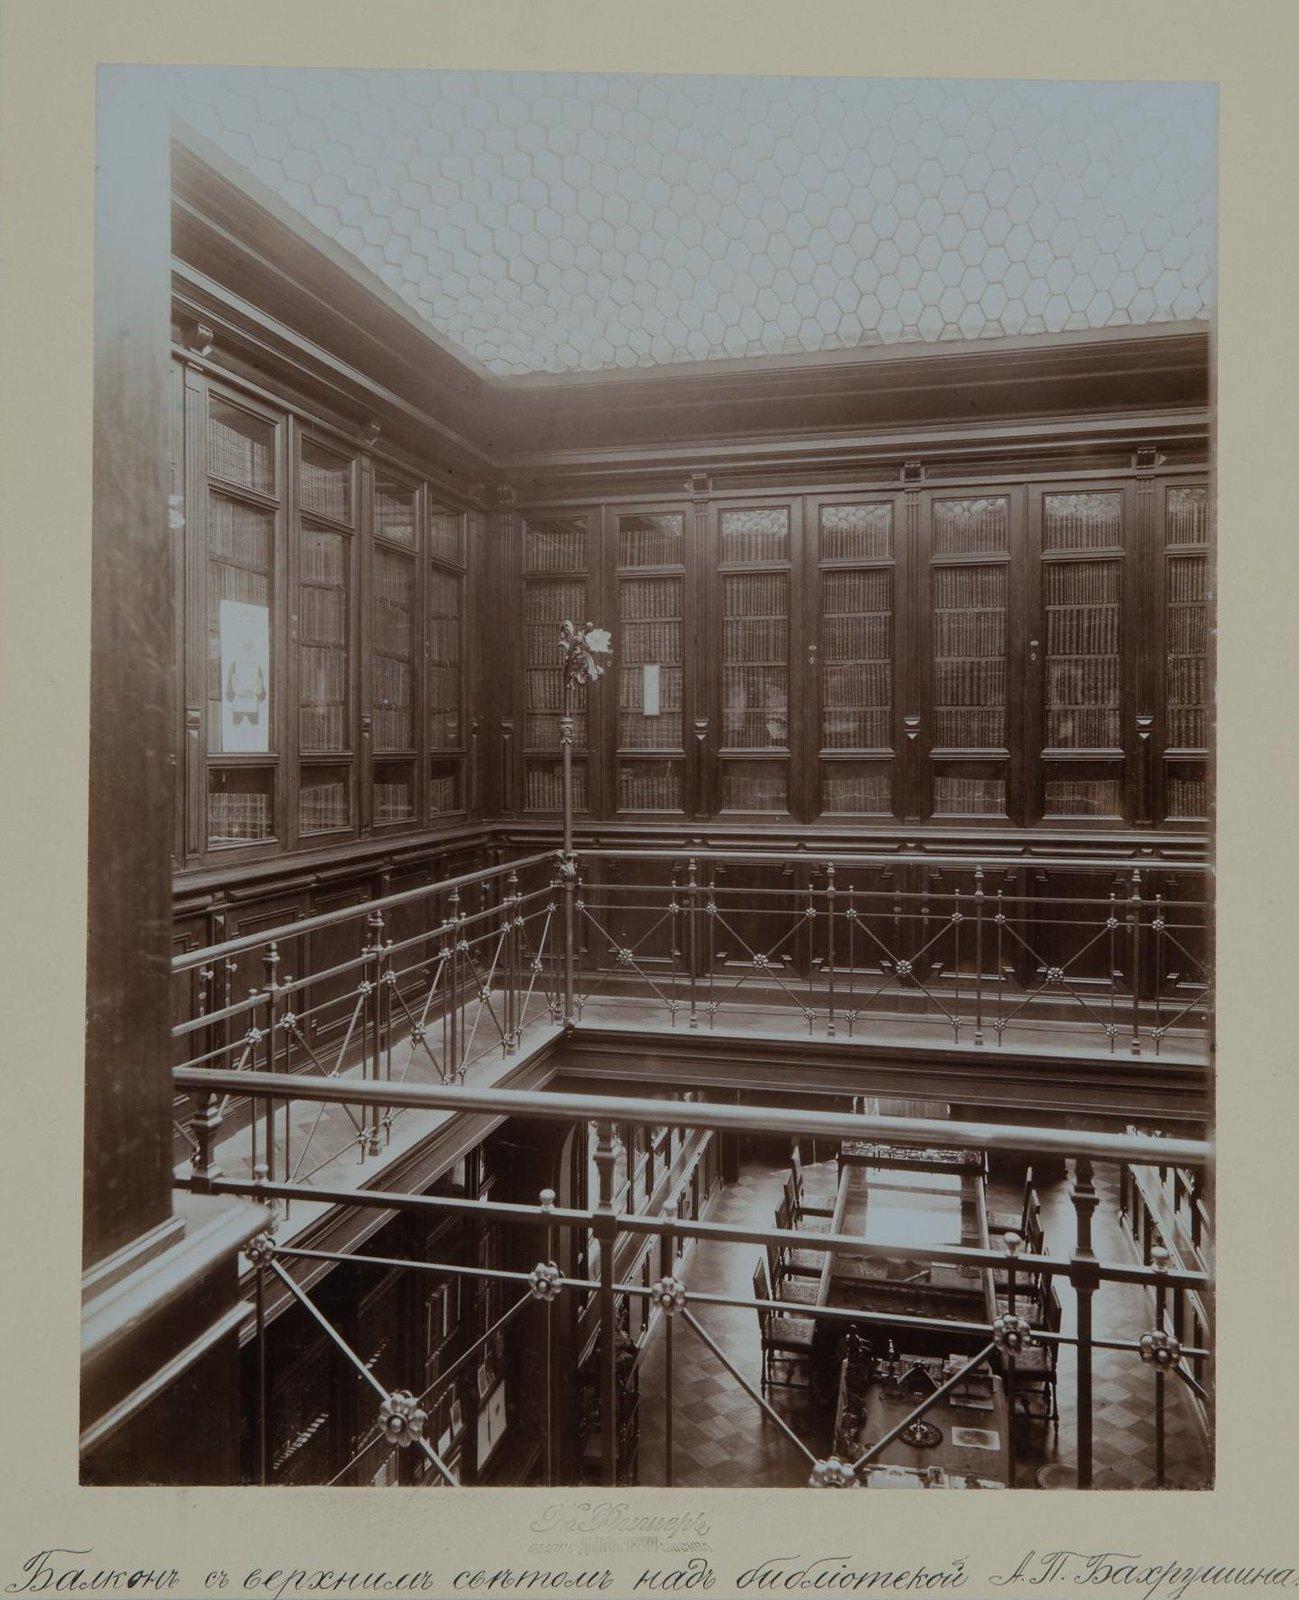 02. Балкон с верхним светом над библиотекой А.П.Бахрушина